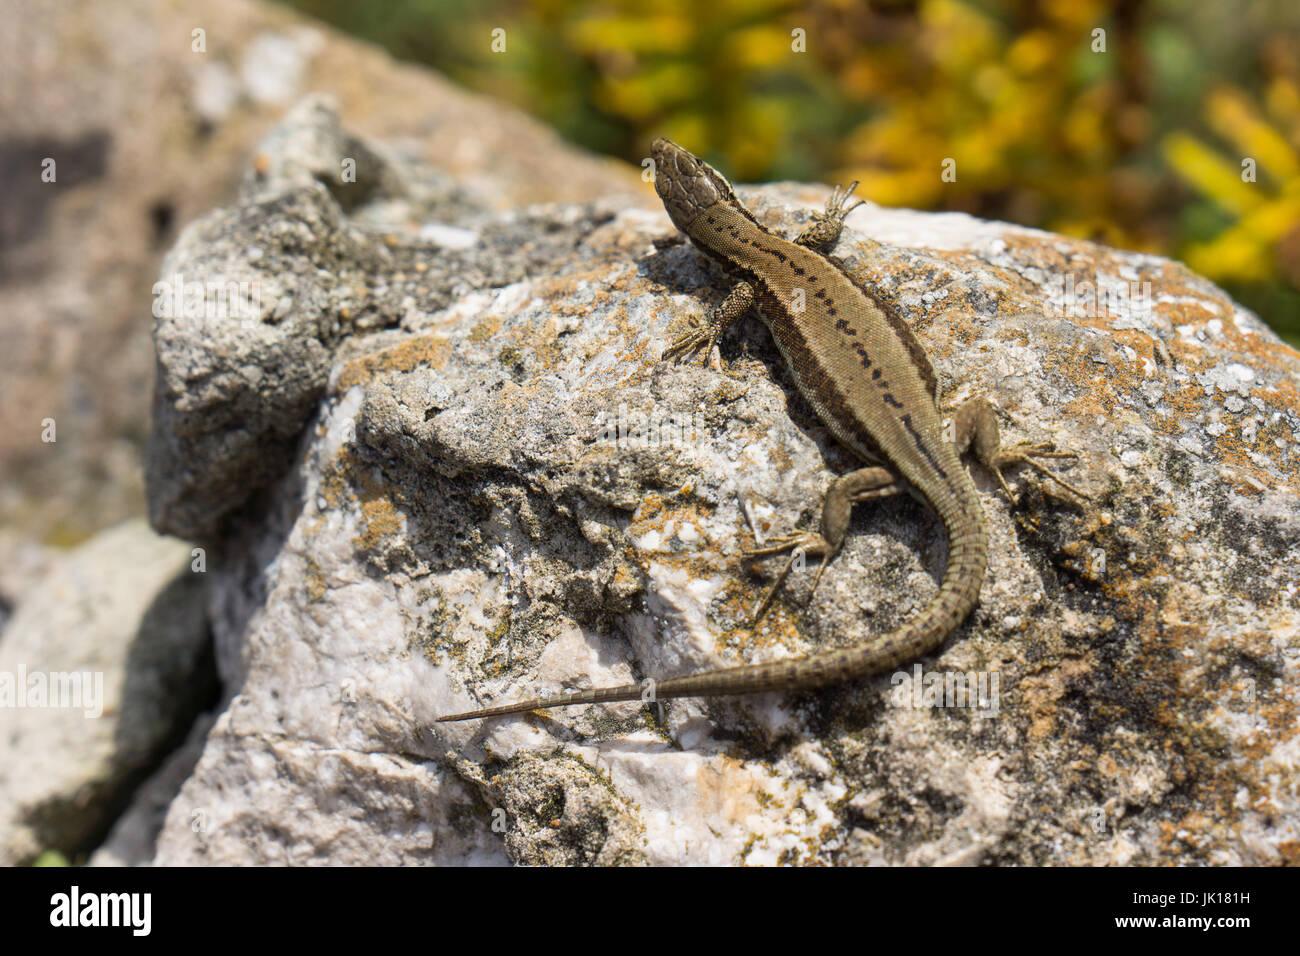 Female common or viviparous lizard, (Zootoca vivipara) which is a Eurasian lizard as found in northern Spain. Stock Photo